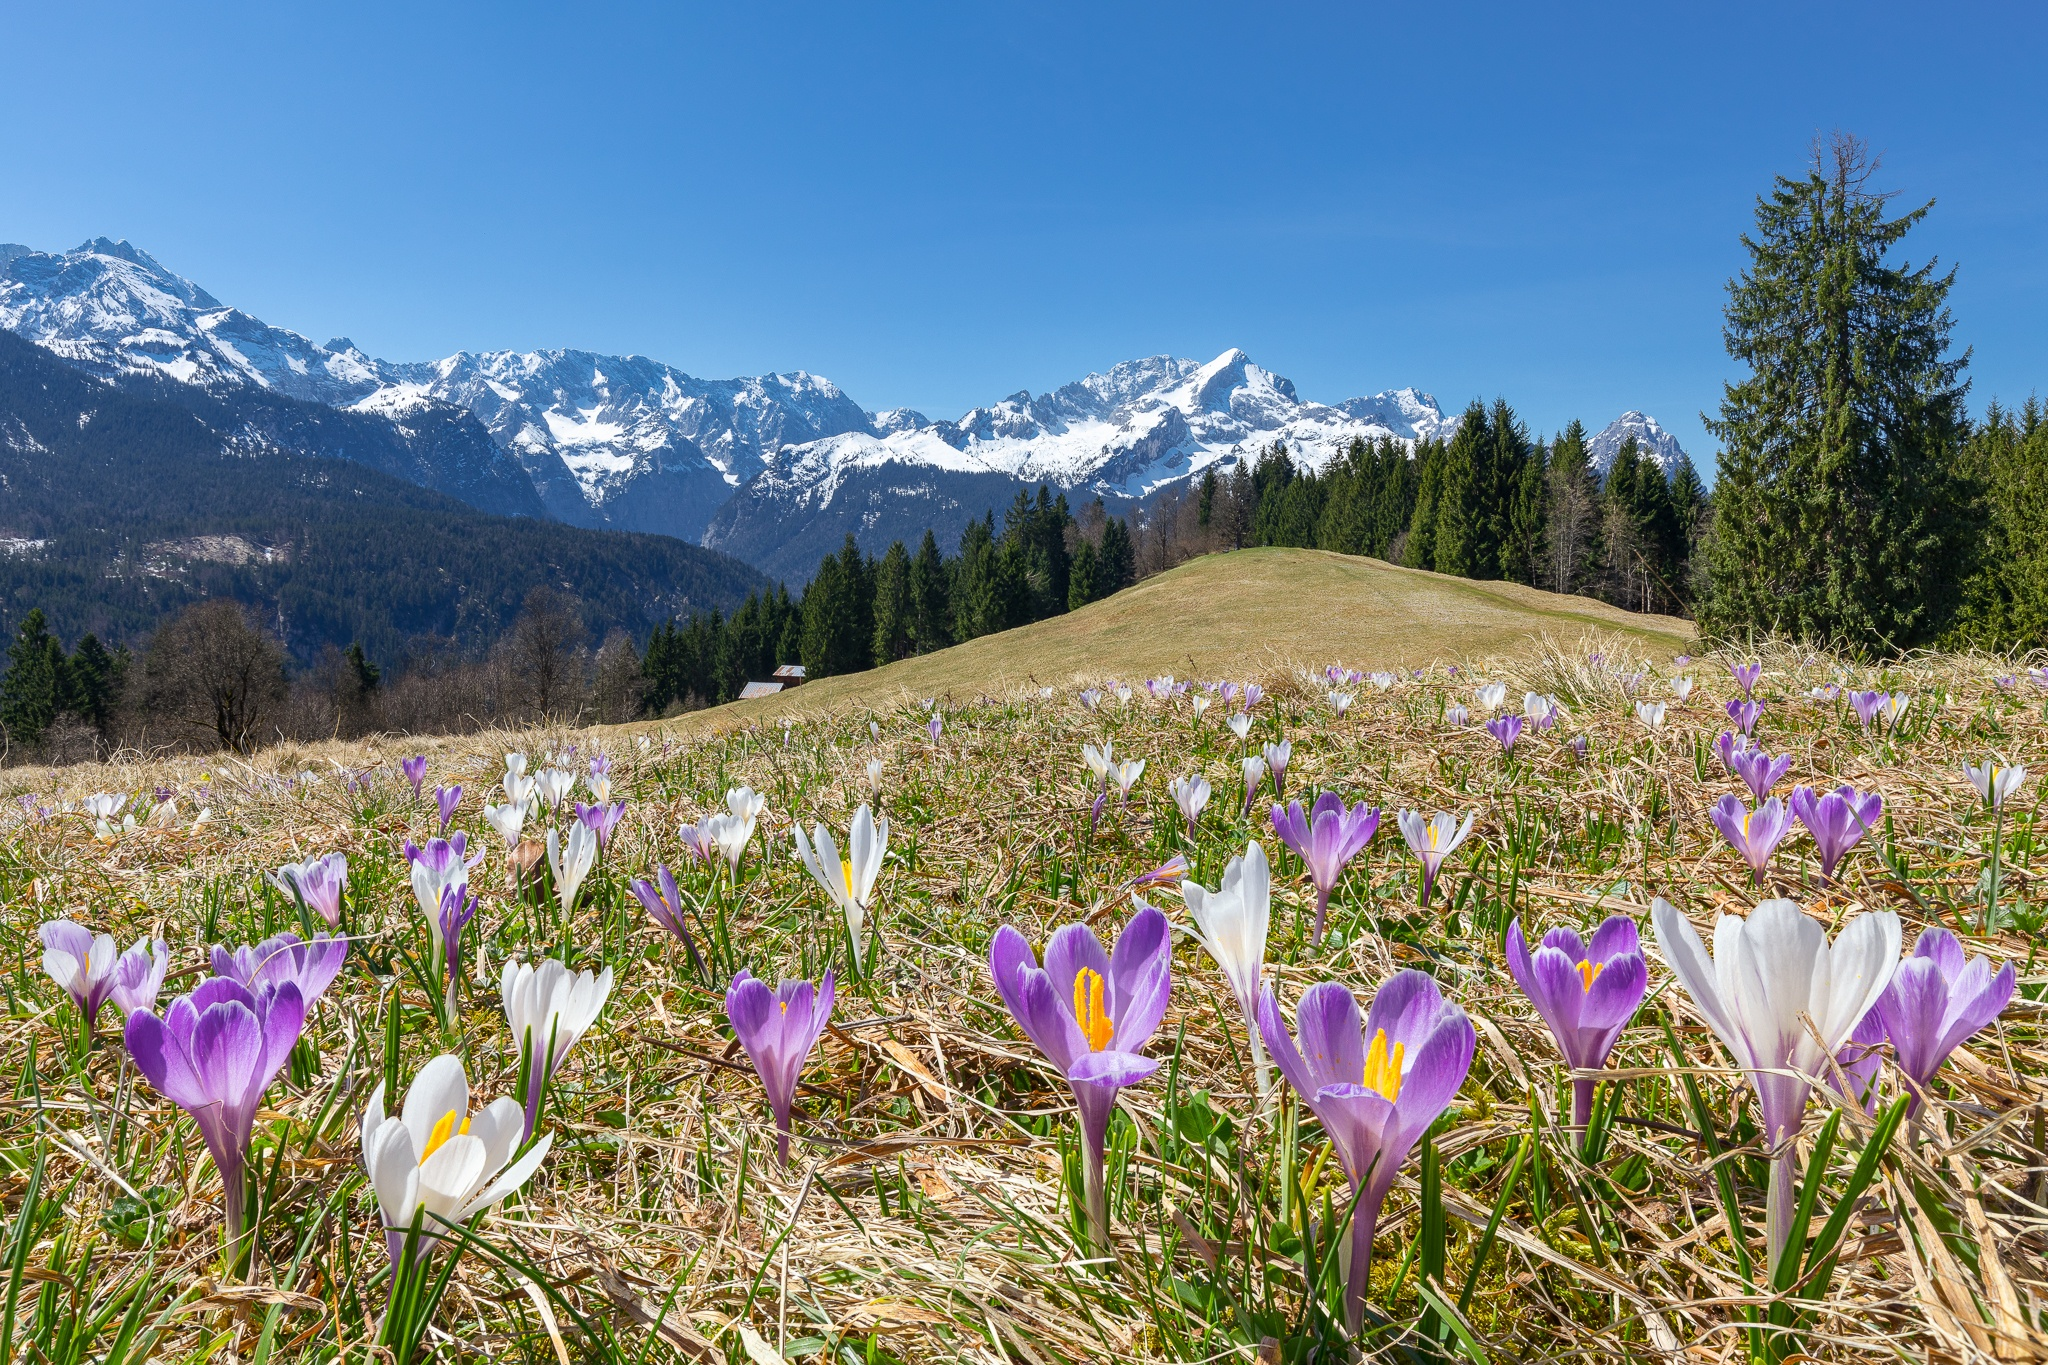 Krokuswiese am Eckbauer bei Garmisch-Partenkirchen